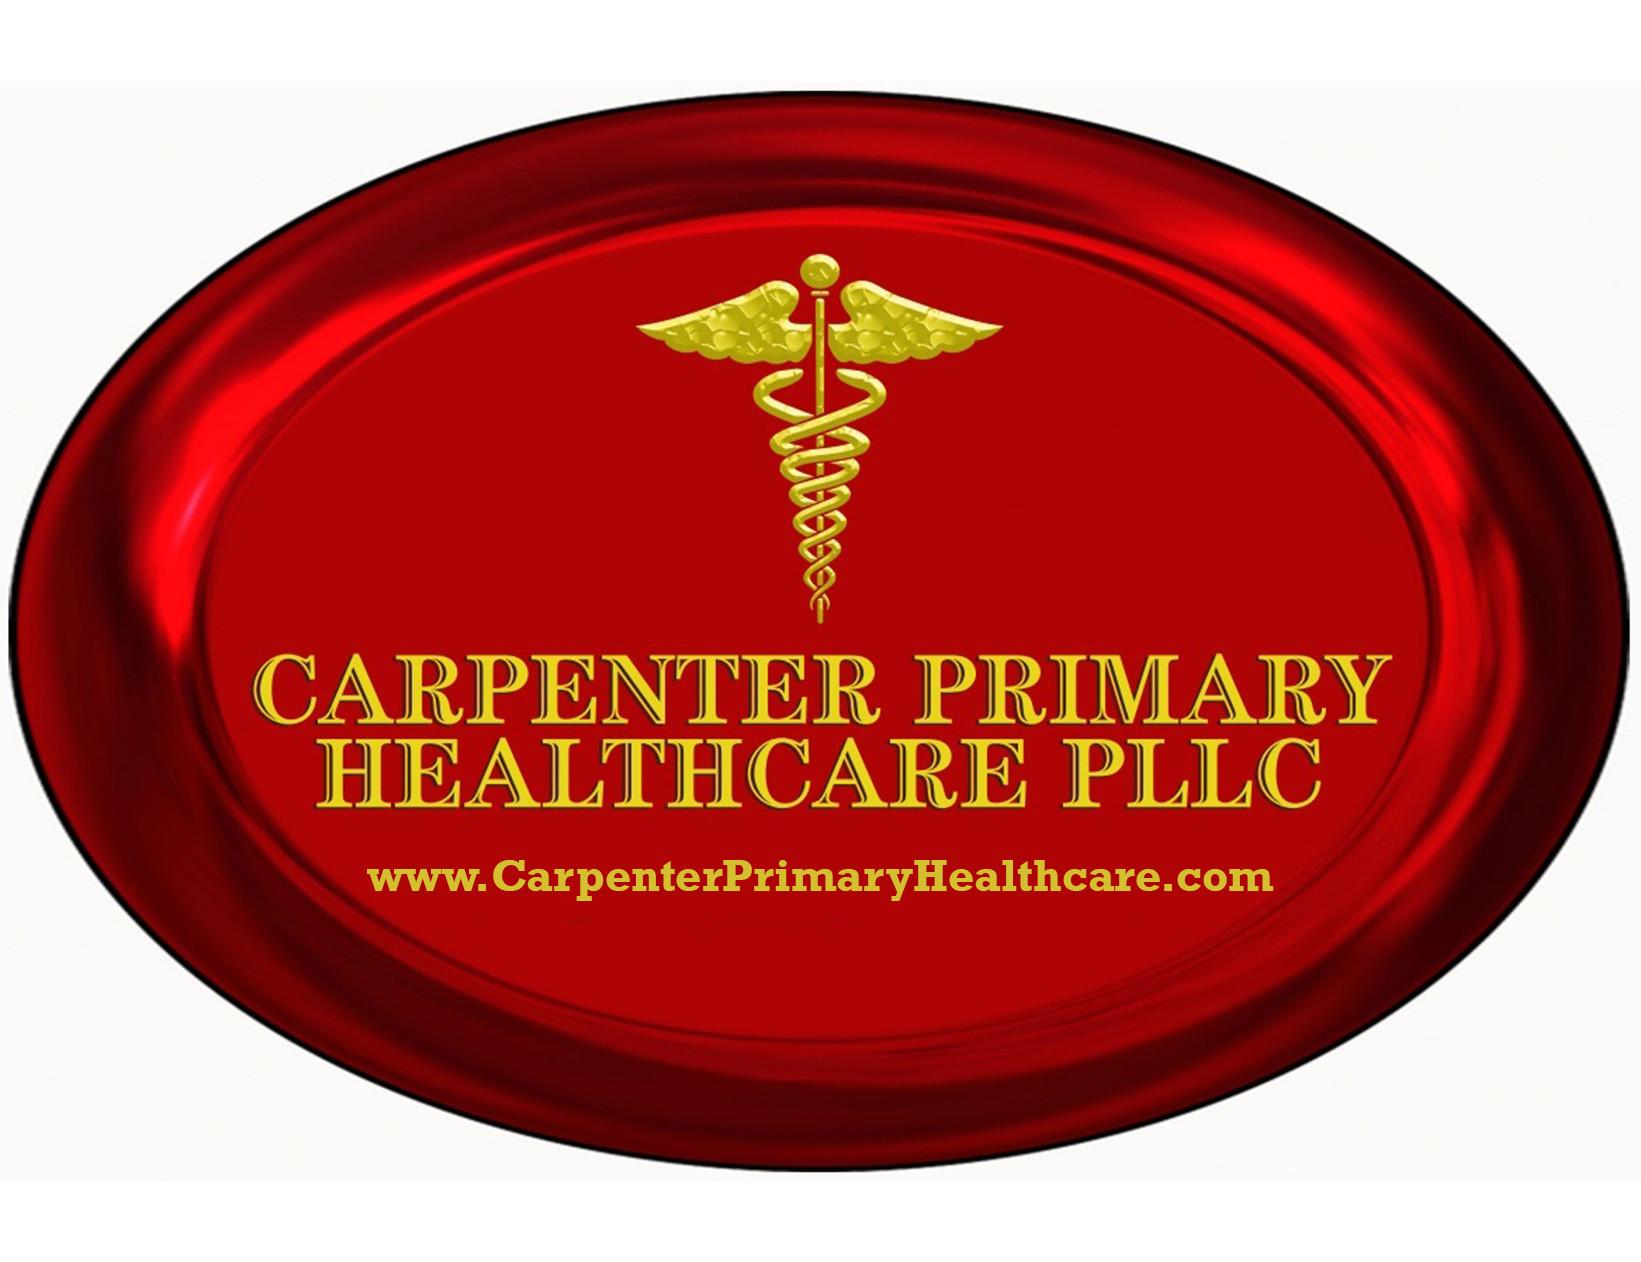 Carpenter Primary Healthcare PLLC